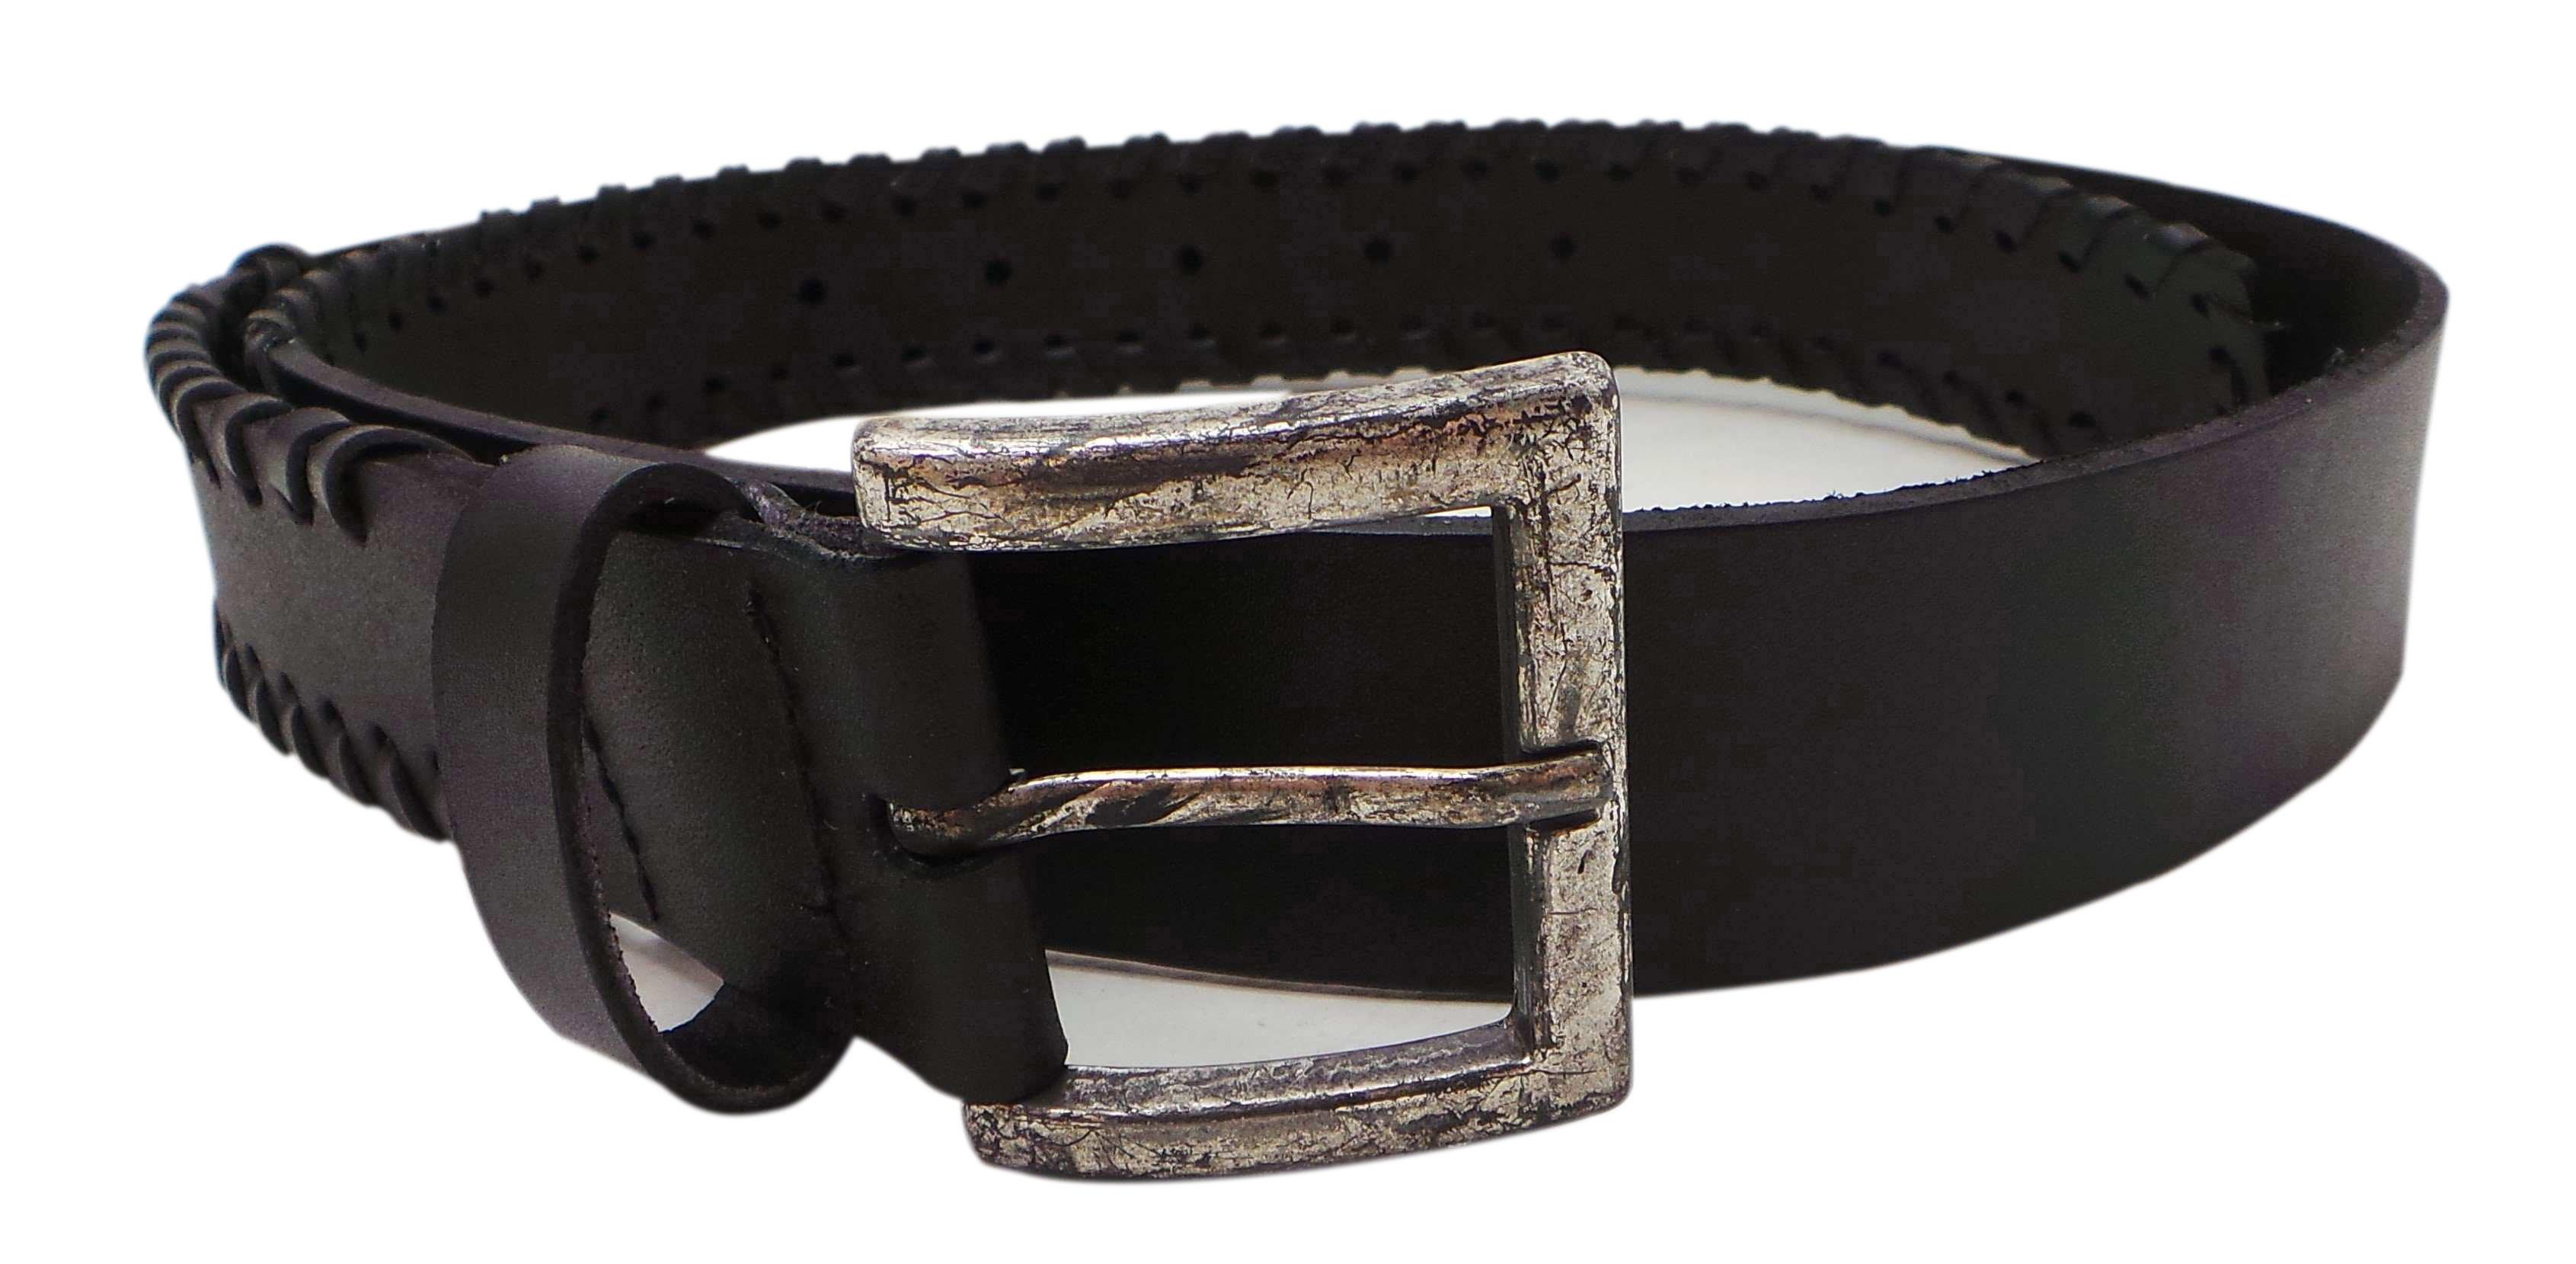 wholesale joblot of 100 damaged faux leather belts